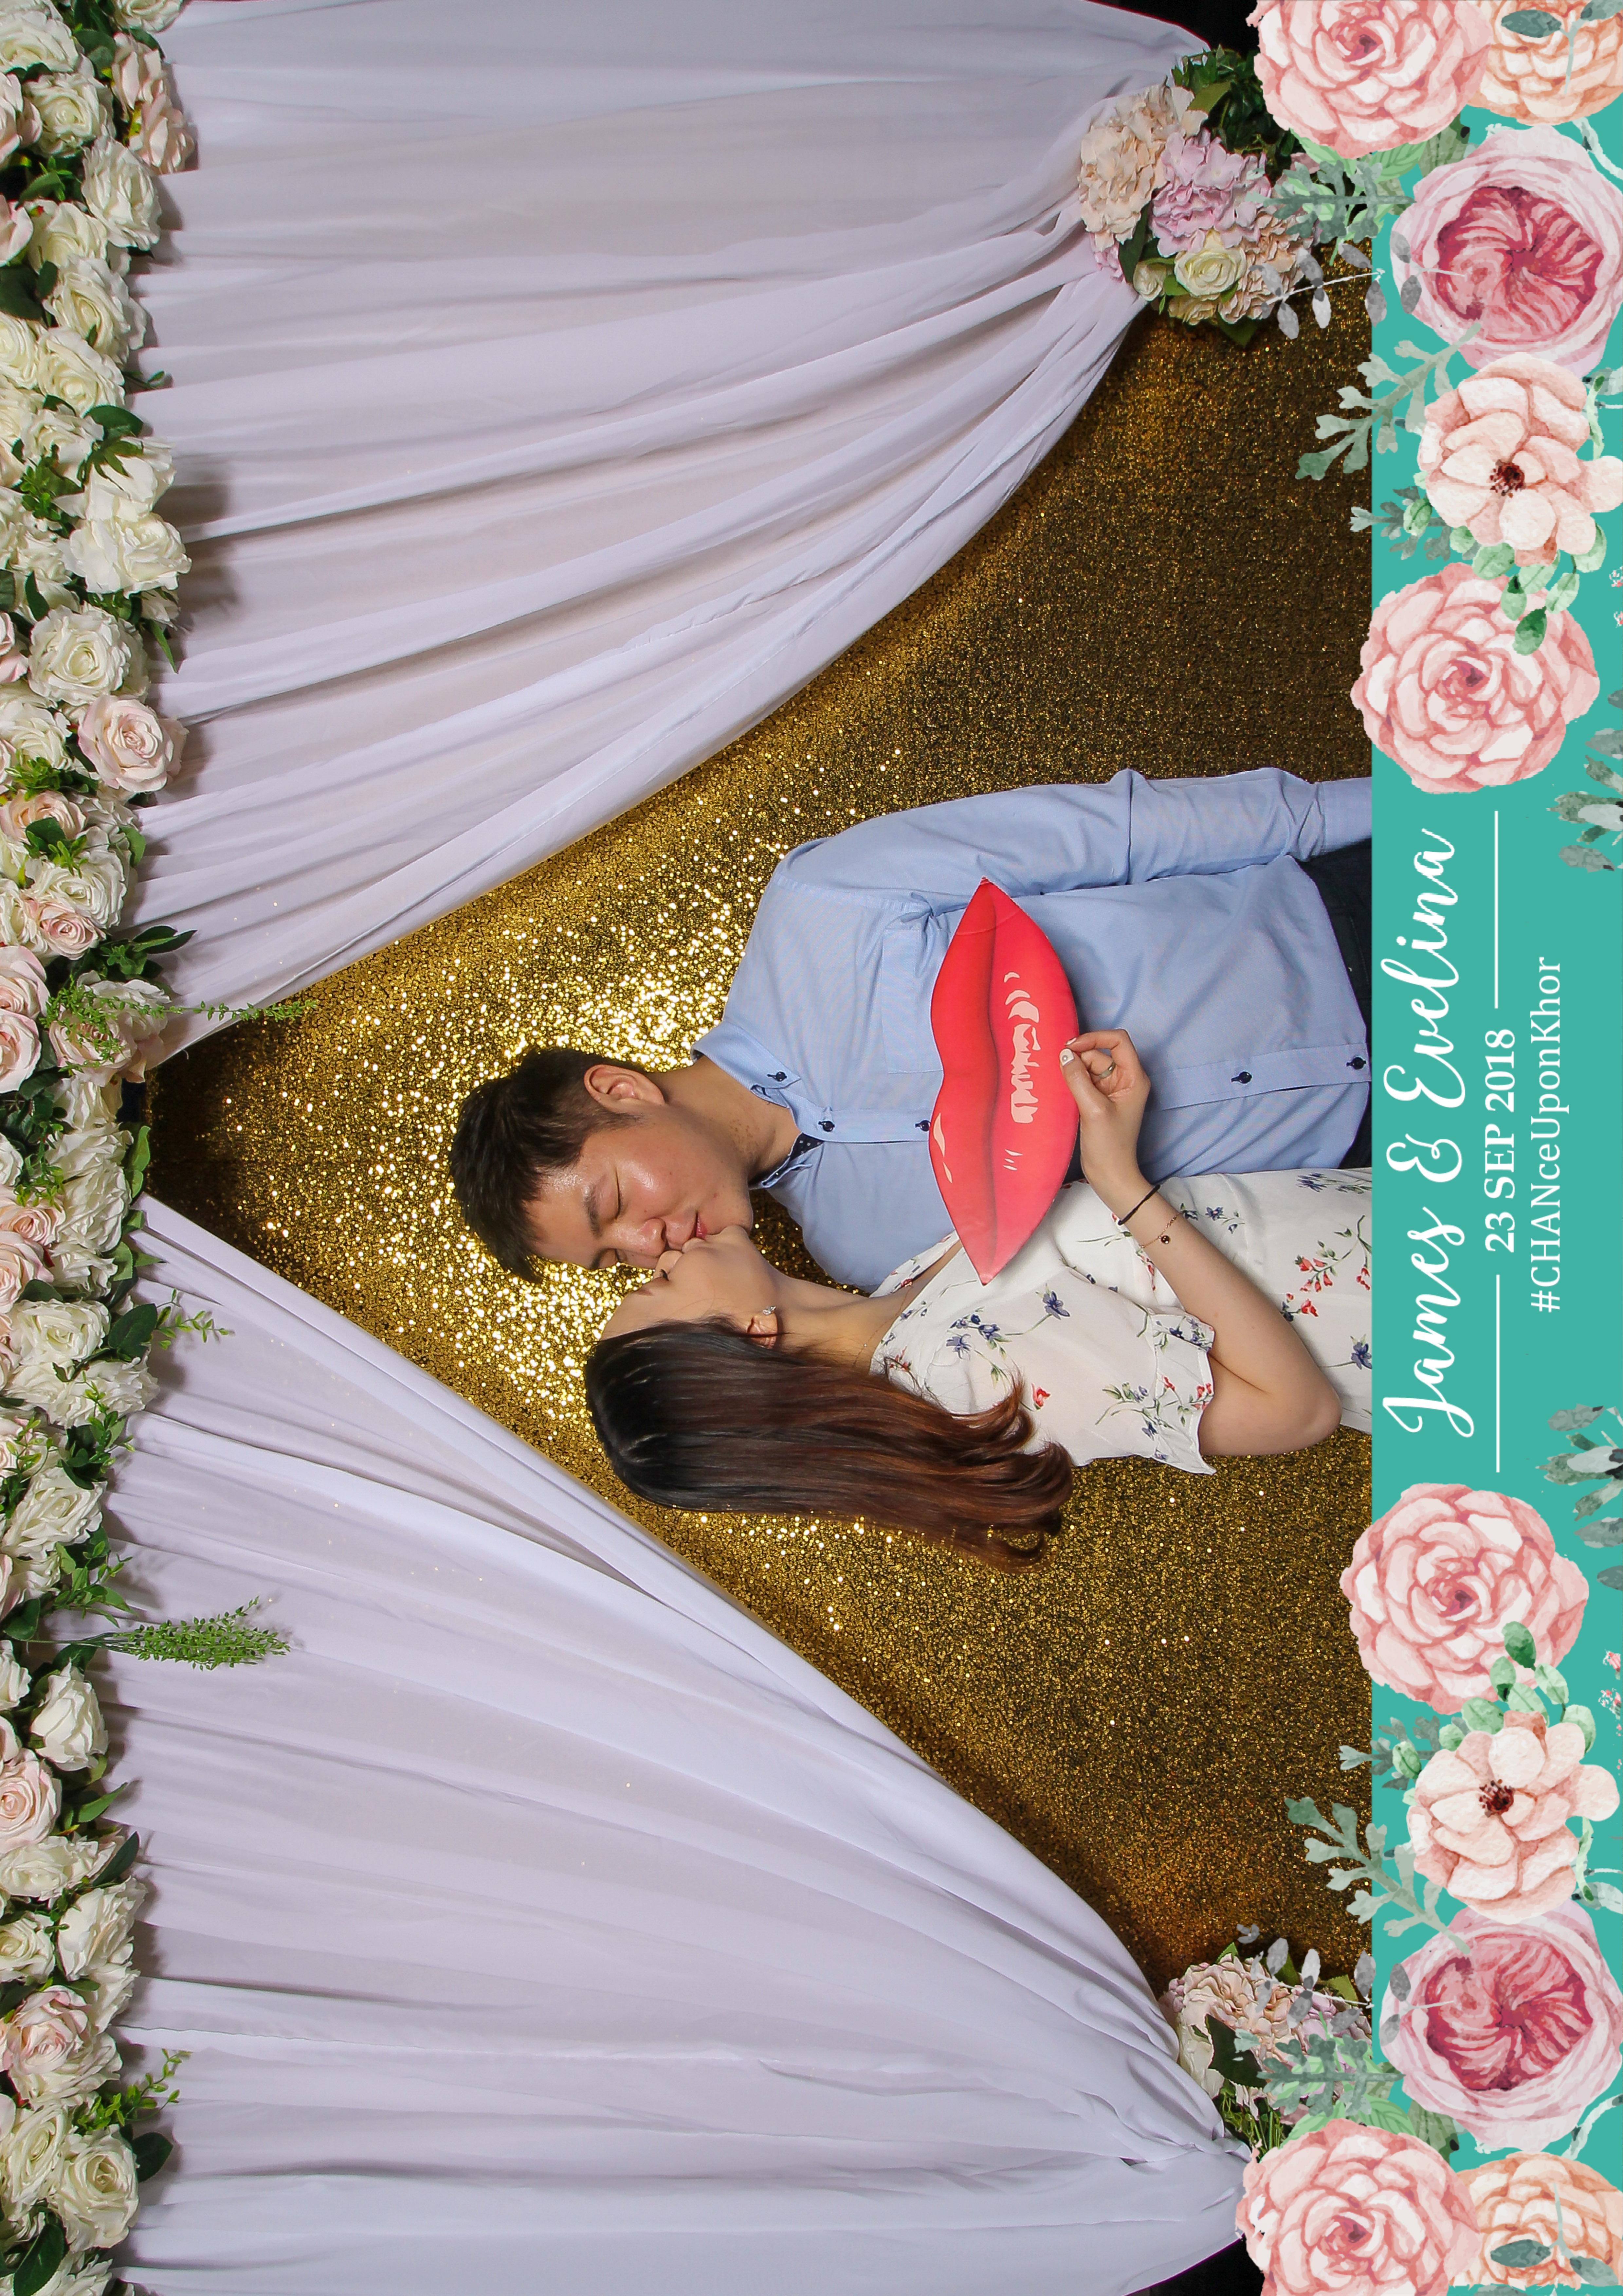 wedding photo booth singapore-37